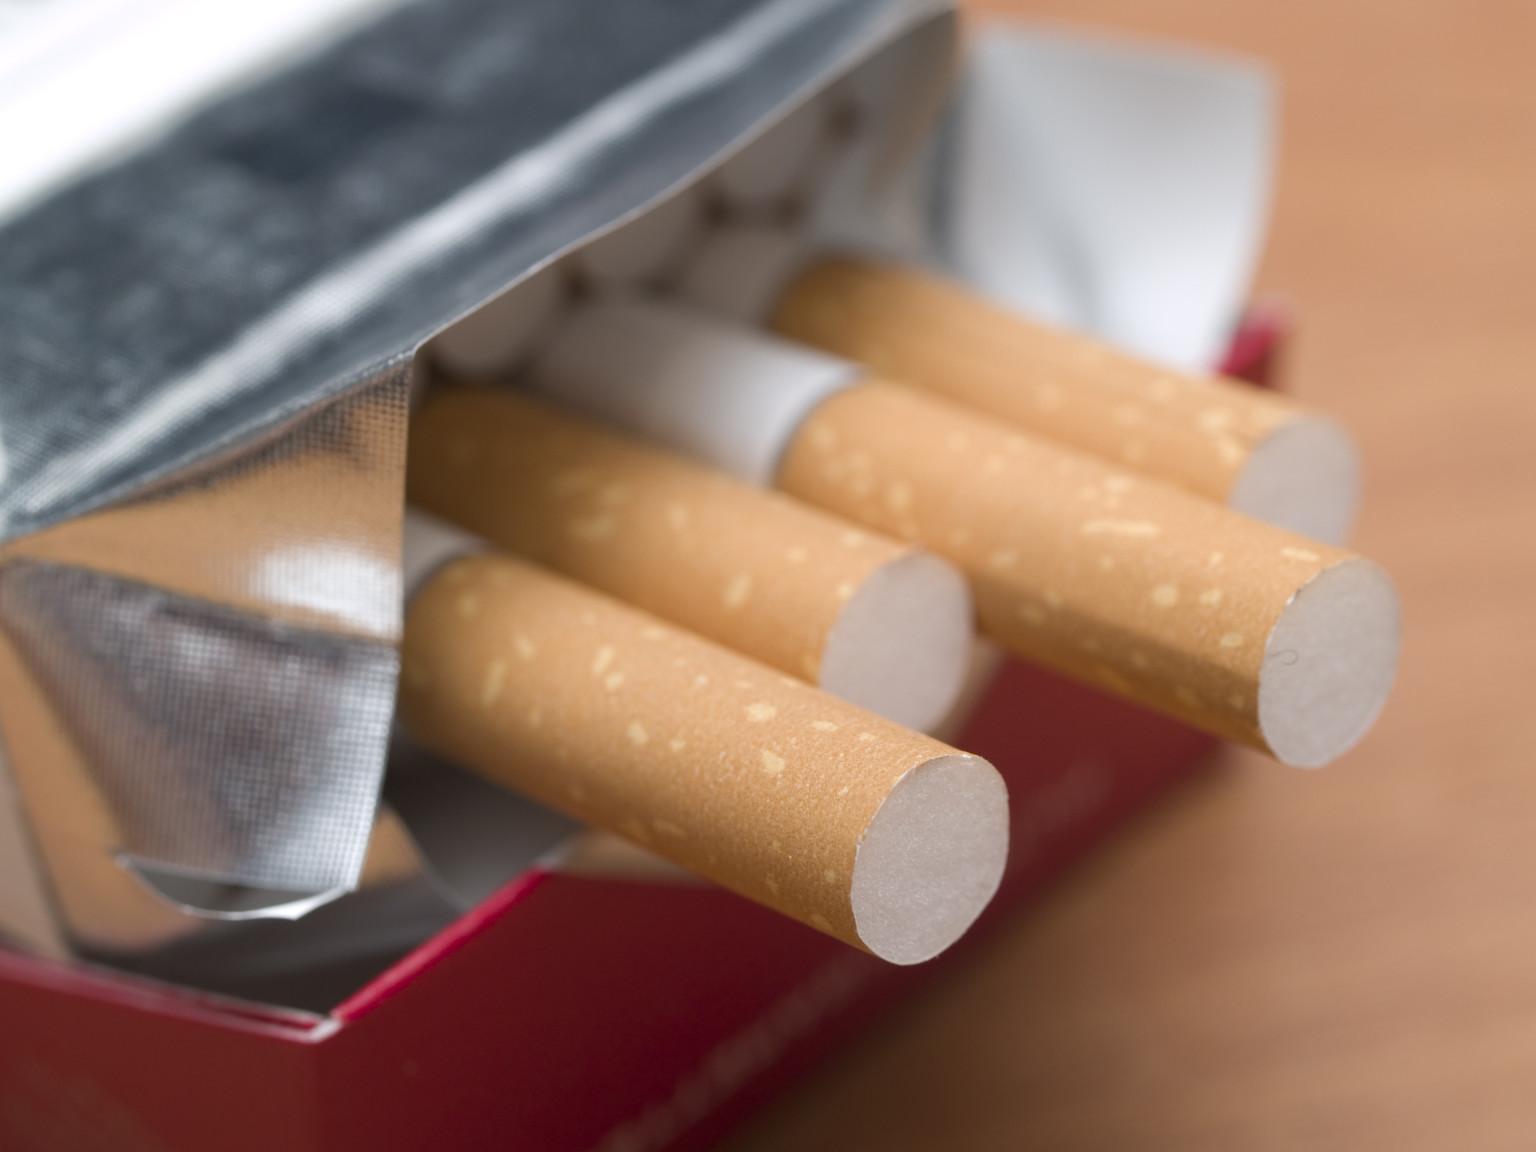 Cheap smokes cigarettes Sobranie Ireland